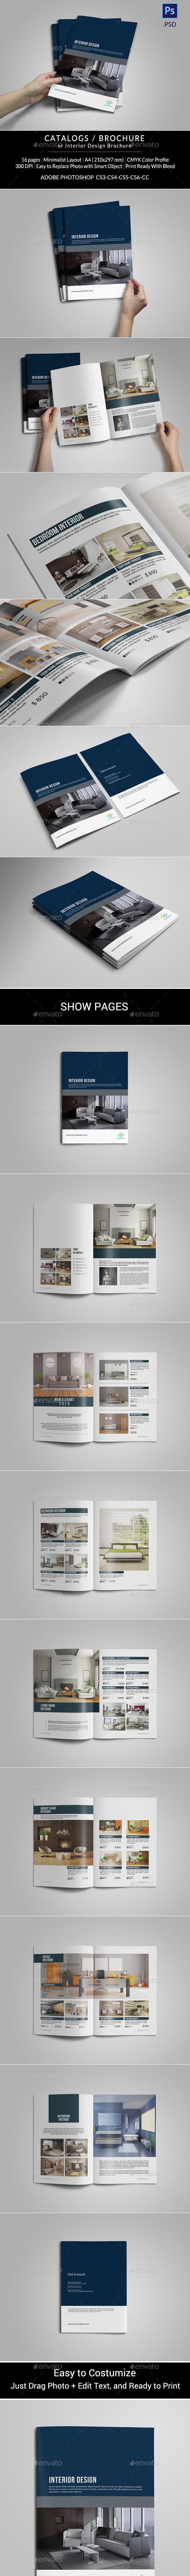 Catalogs / Brochure / Portfolio - Catalogs Brochures